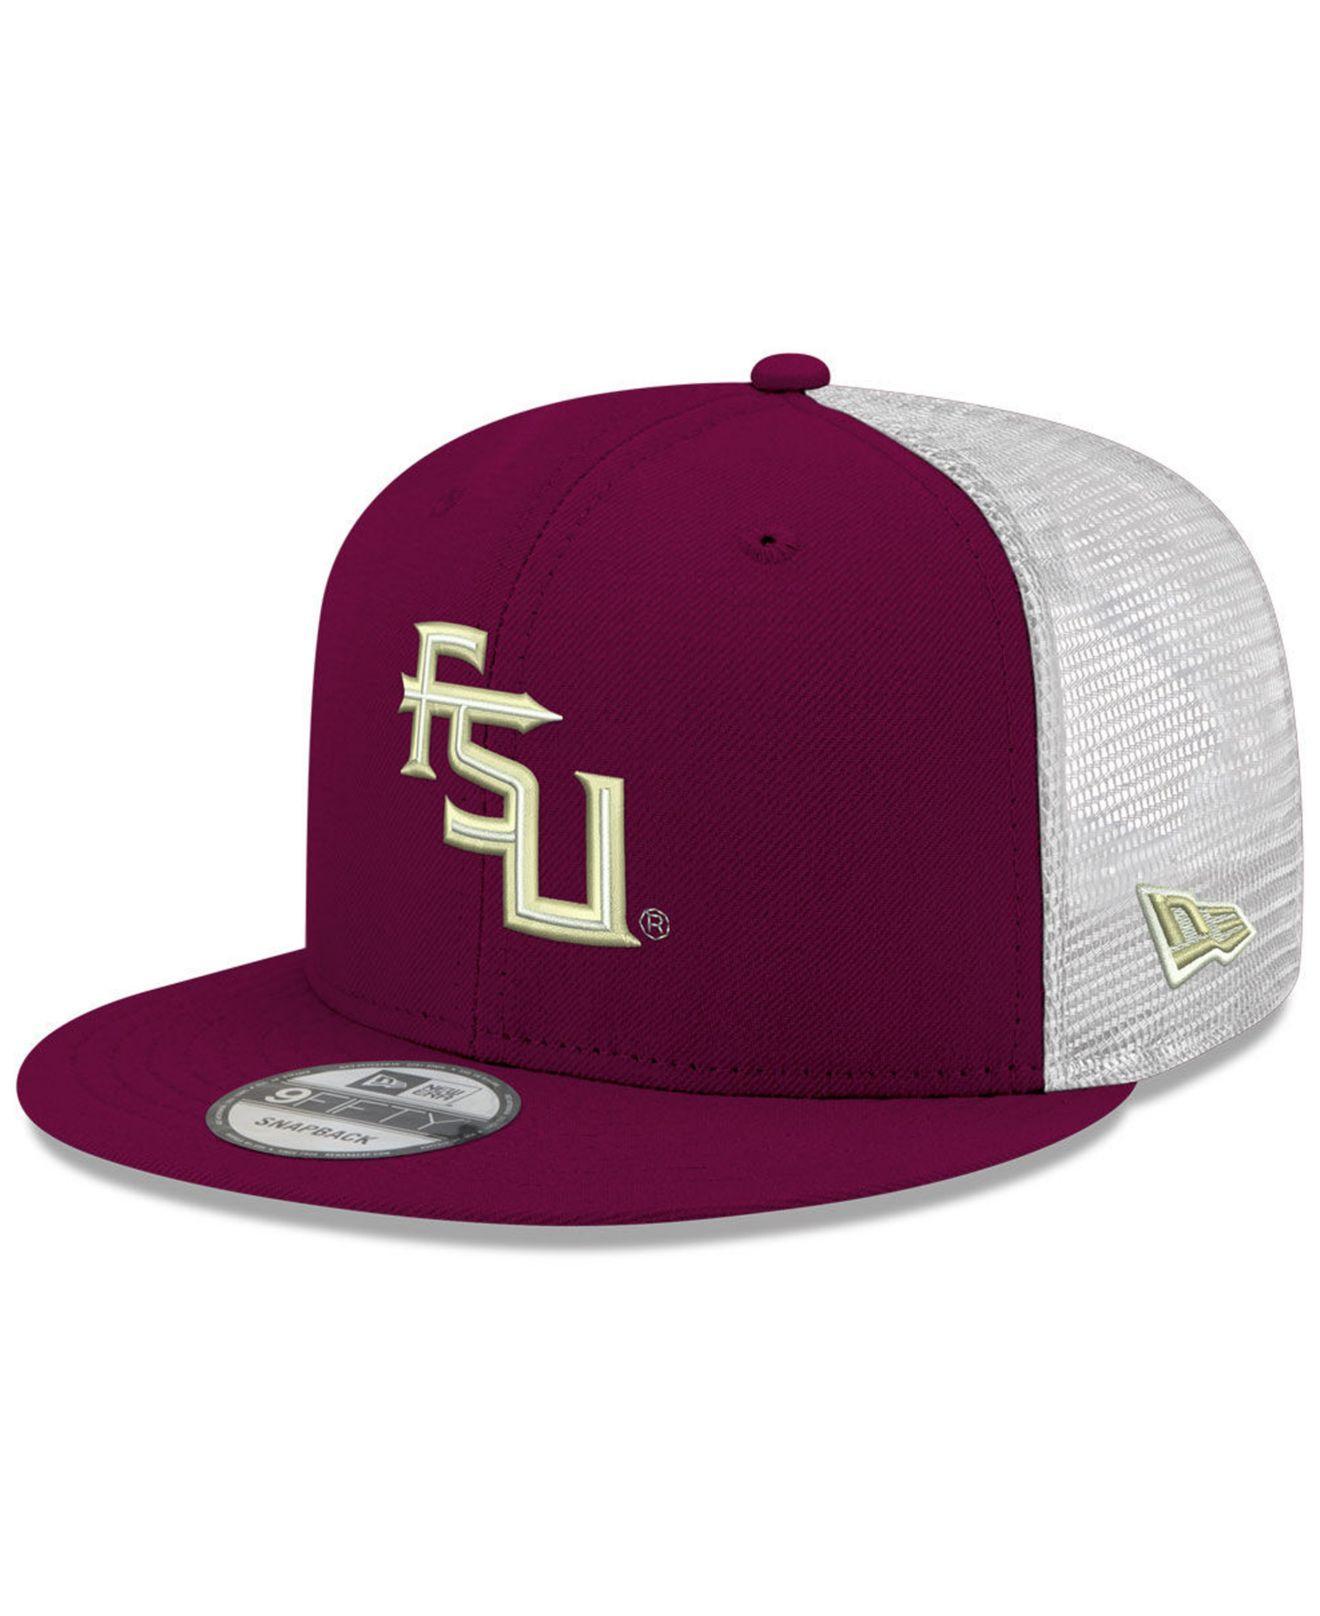 size 40 9c5b4 acb48 KTZ. Men s Purple Florida State Seminoles Tc Meshback Snapback Cap